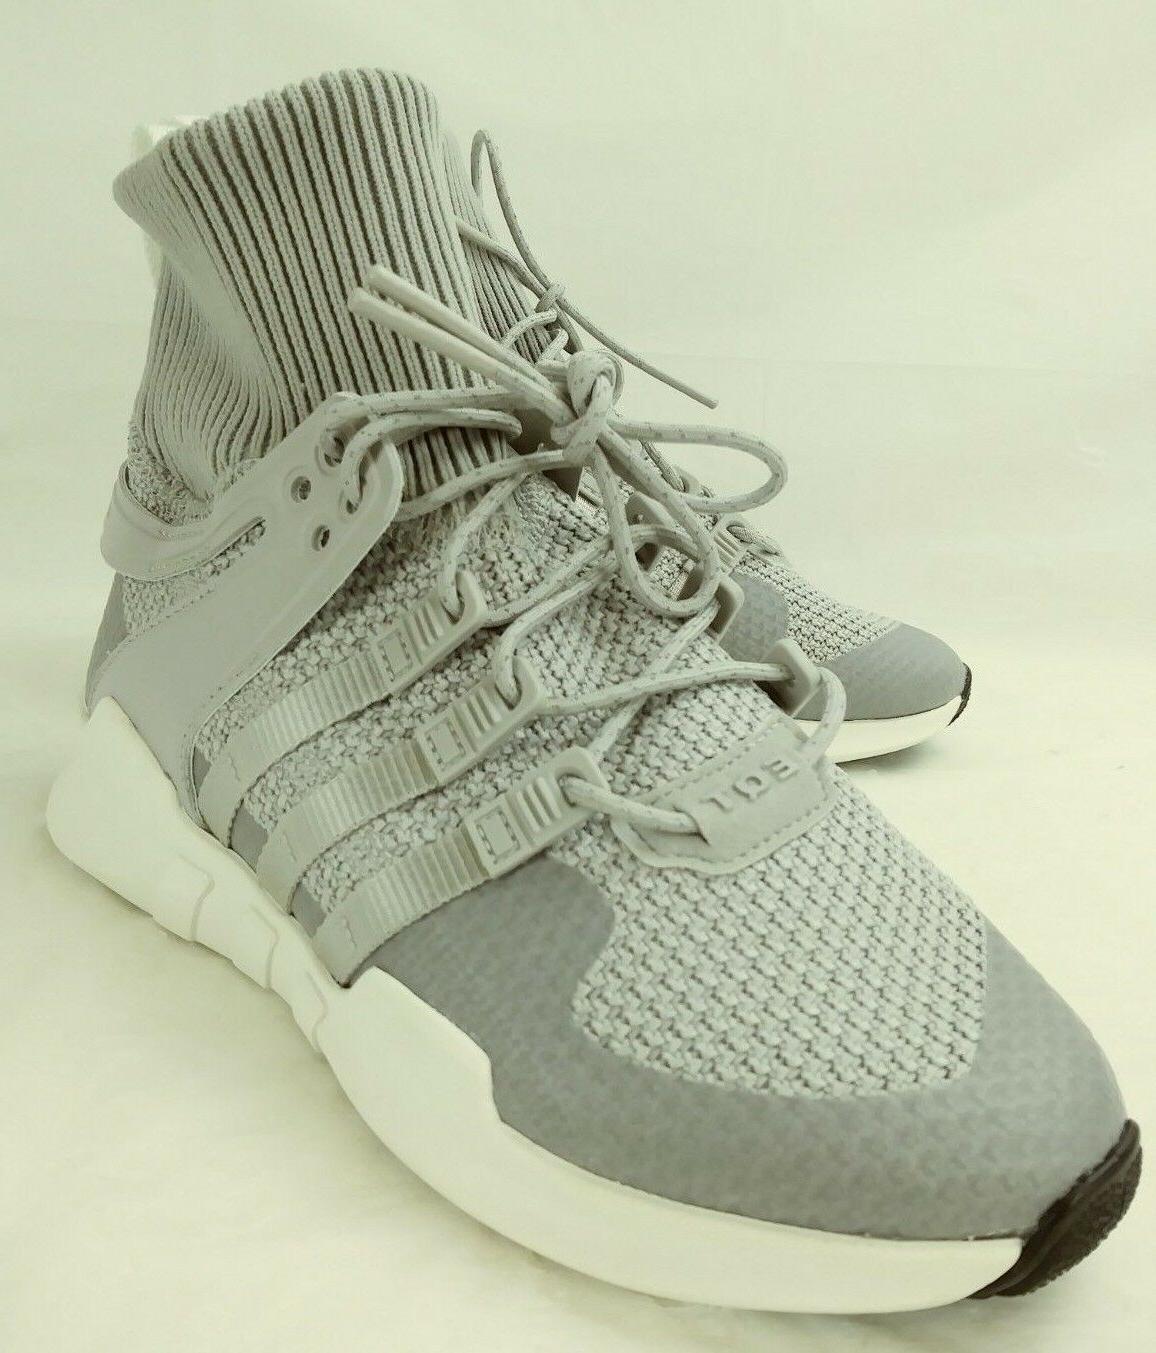 Adidas APE 779001 Boys Shoes Sock Sneakers Equipment US 4 Gr